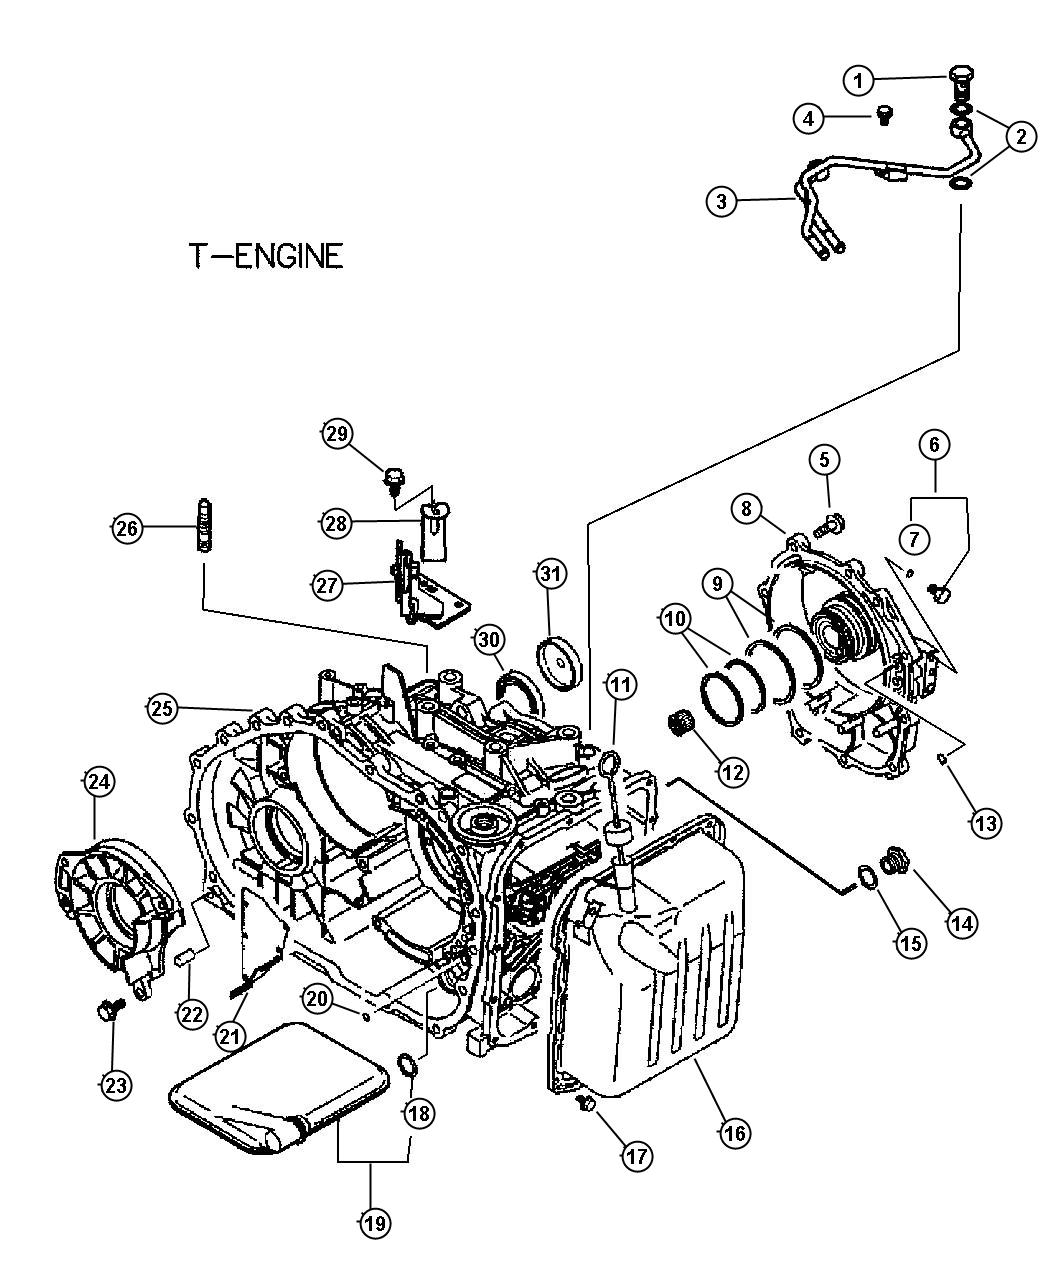 2005 chrysler sebring fuel filter